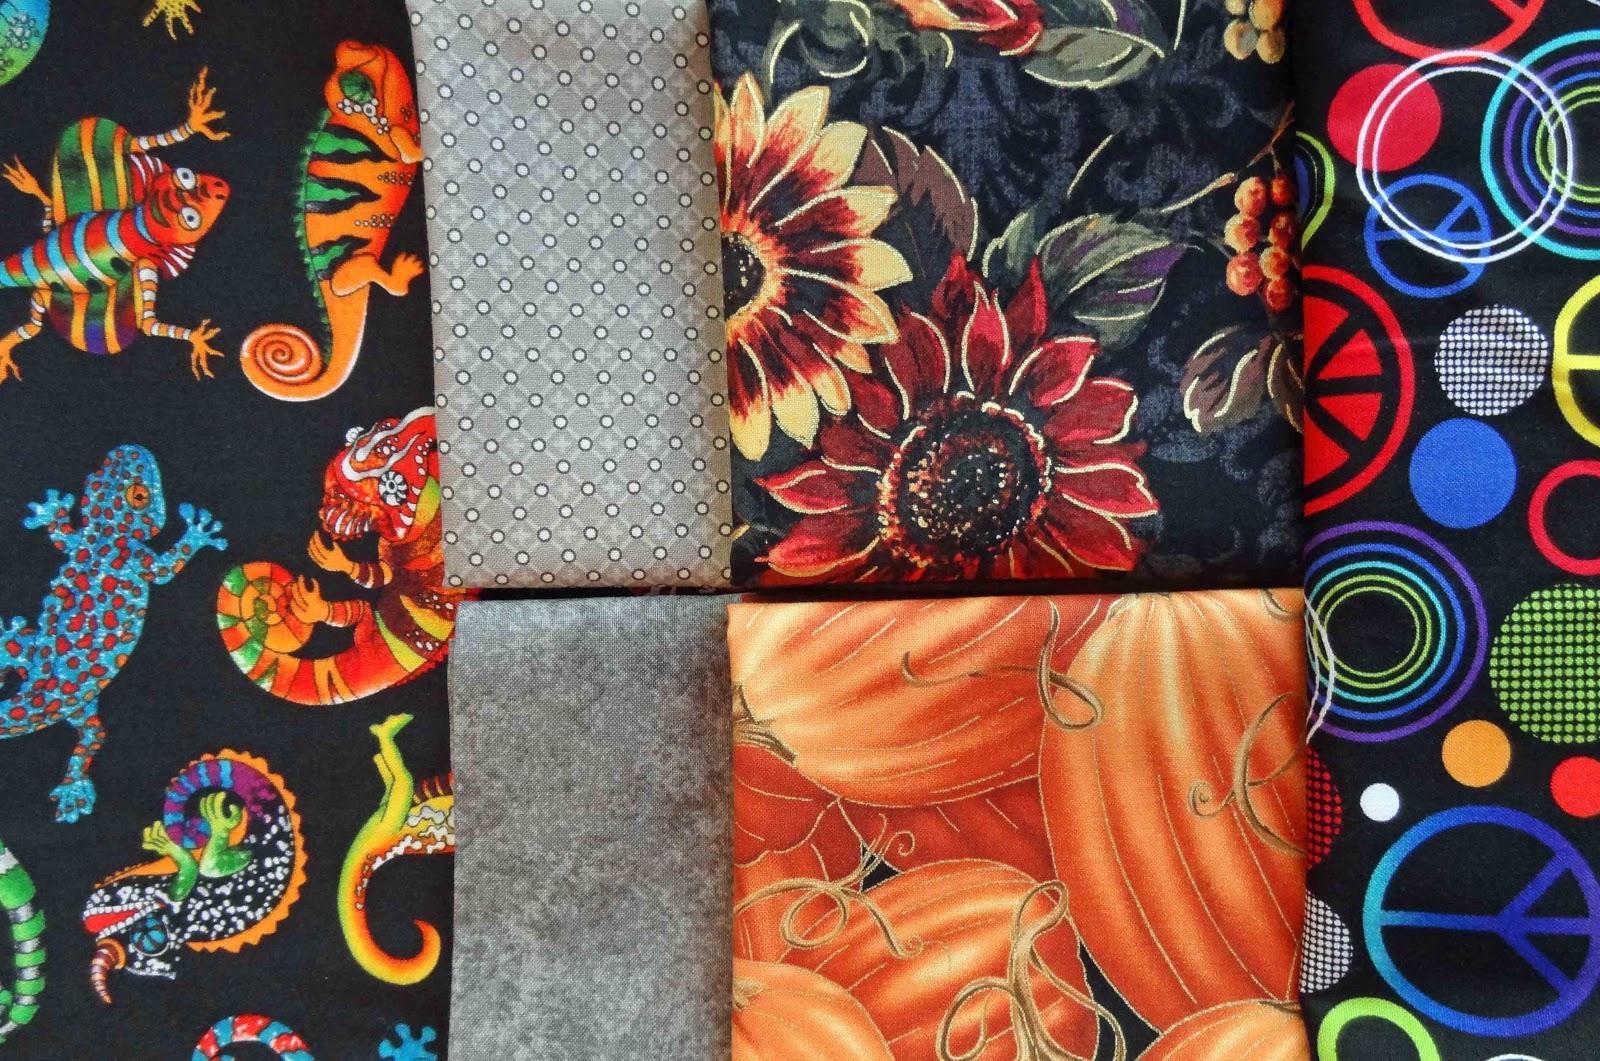 http://2.bp.blogspot.com/-7o1VSuNN5Ac/UIPn3PN0dFI/AAAAAAAACbo/AbZDd9UwWio/s1600/12+10+21+Shiloam+Springs+Fabrics.jpg